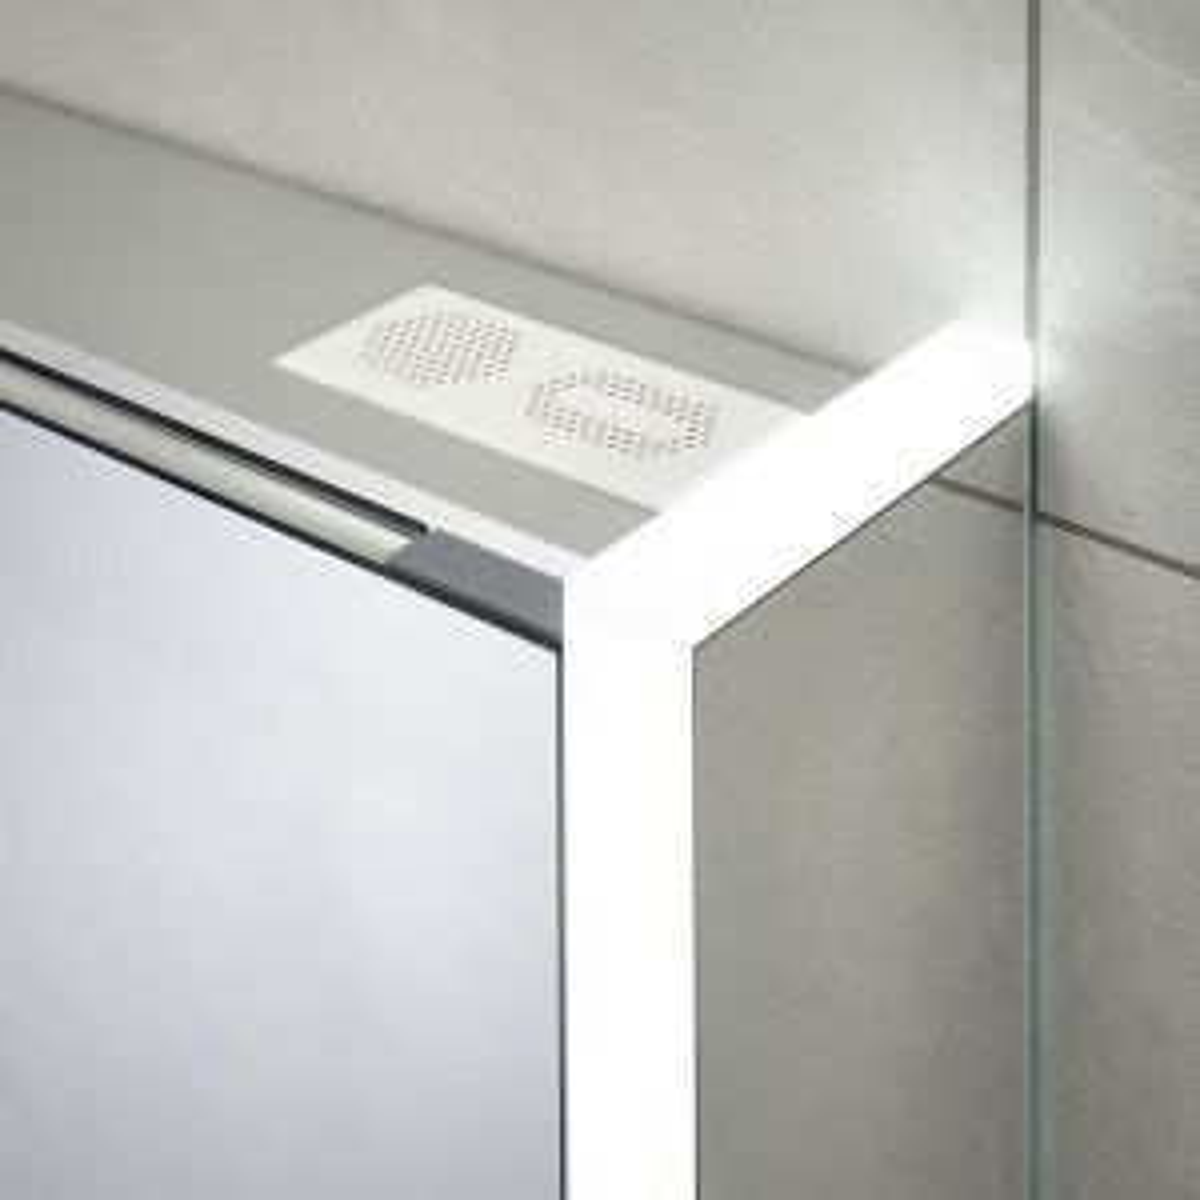 Sensio Ainsley Triple Diffused LED Mirrored Cabinet Speaker